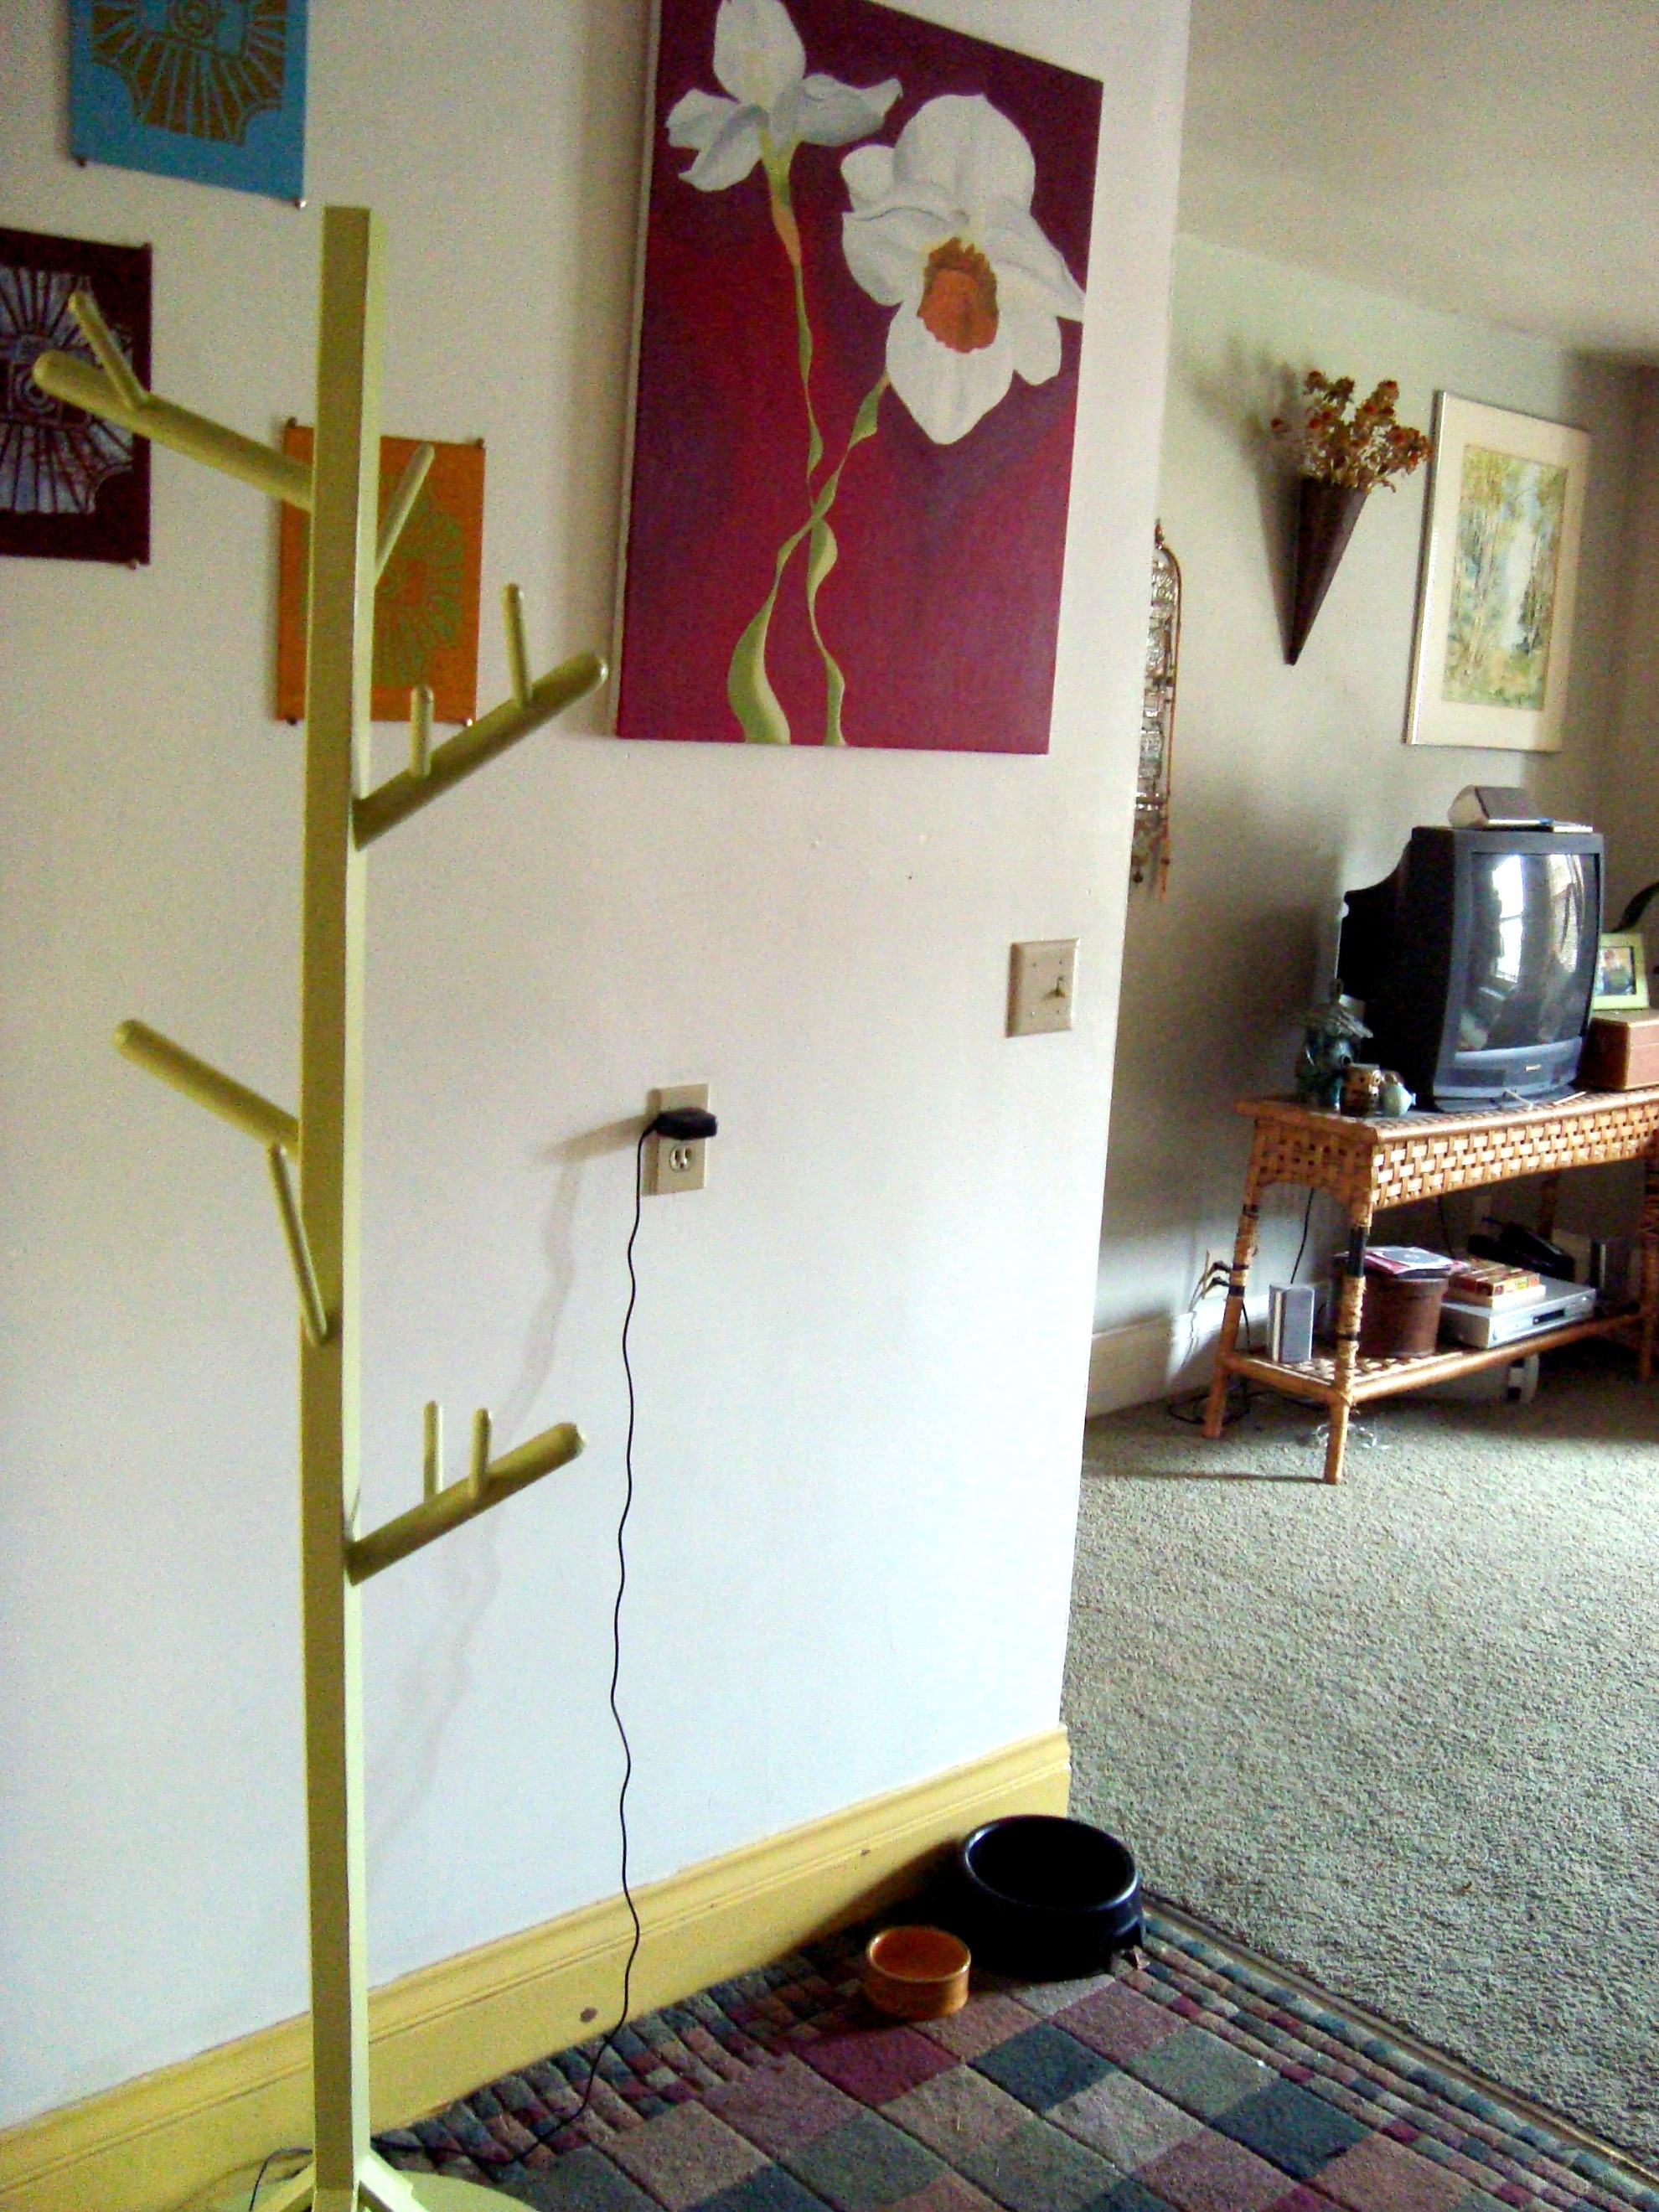 Best ideas about DIY Coat Racks . Save or Pin DIY Coat Rack Now.